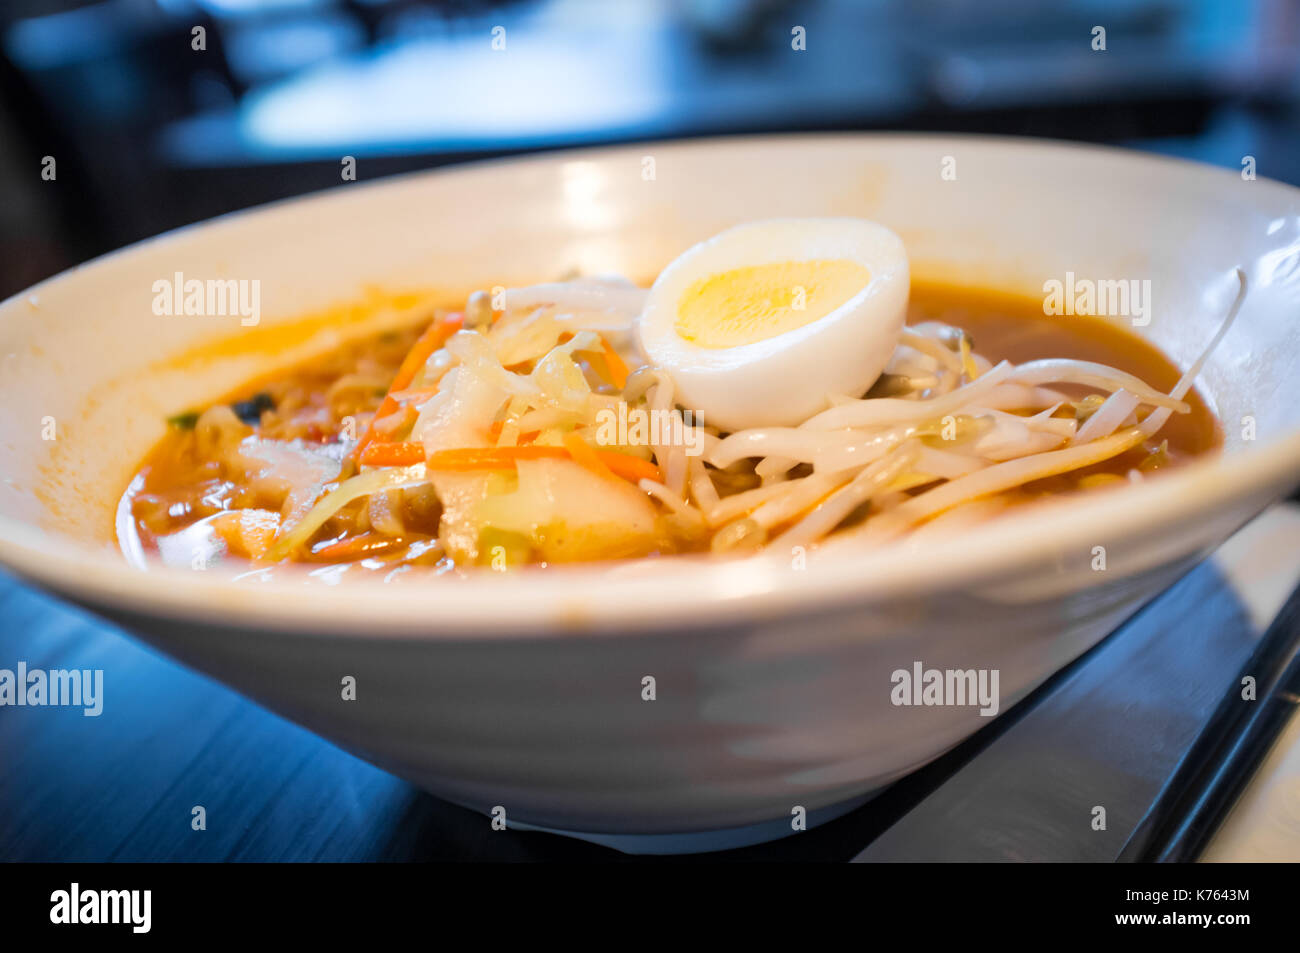 how to make hard boiled eggs in ramen